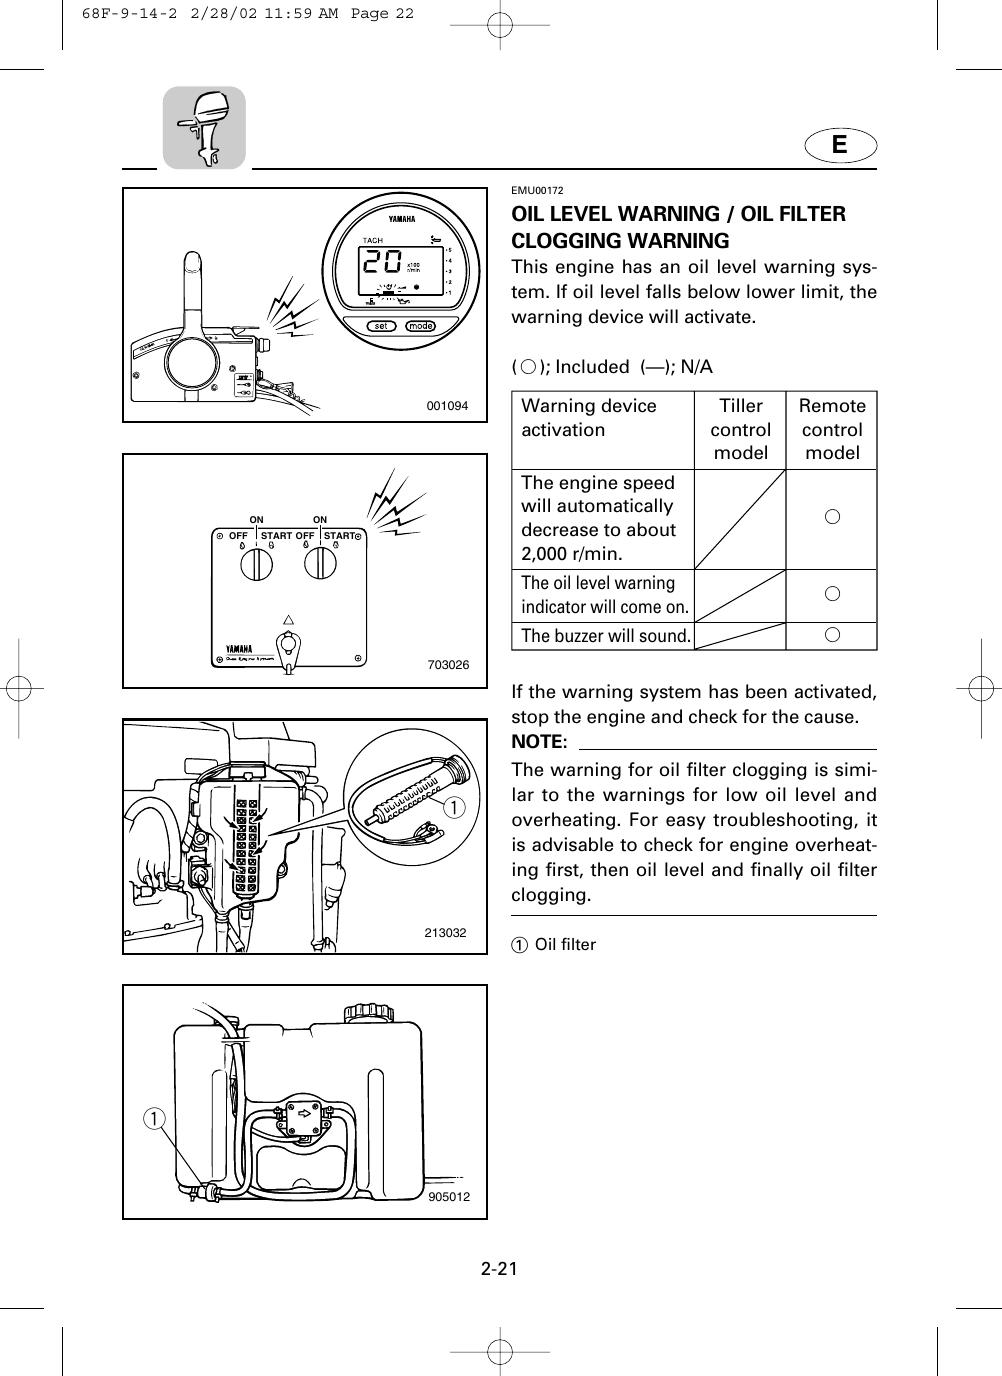 Yamaha Outboard Motor Lz150B Users Manual Z150B, LZ150B